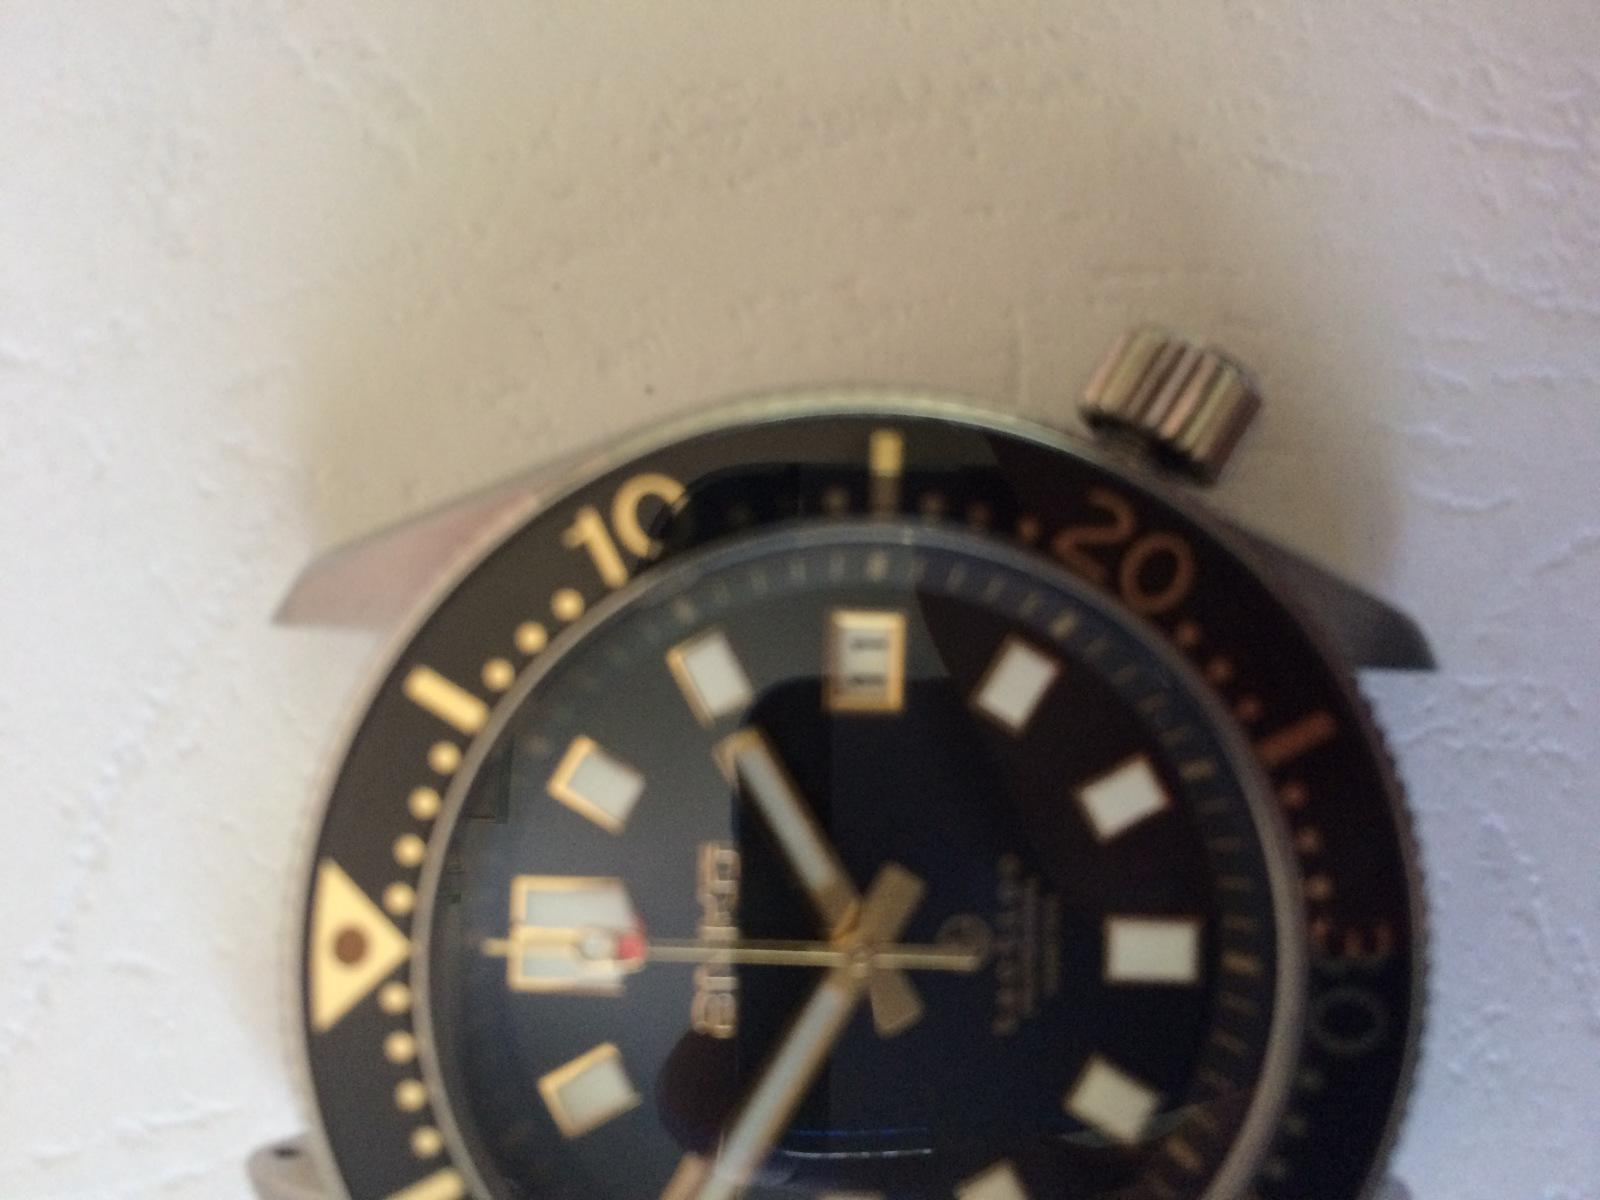 Pequeña comparativa: ANKO vs SUMO vs OCEAN ONE 23tfln9